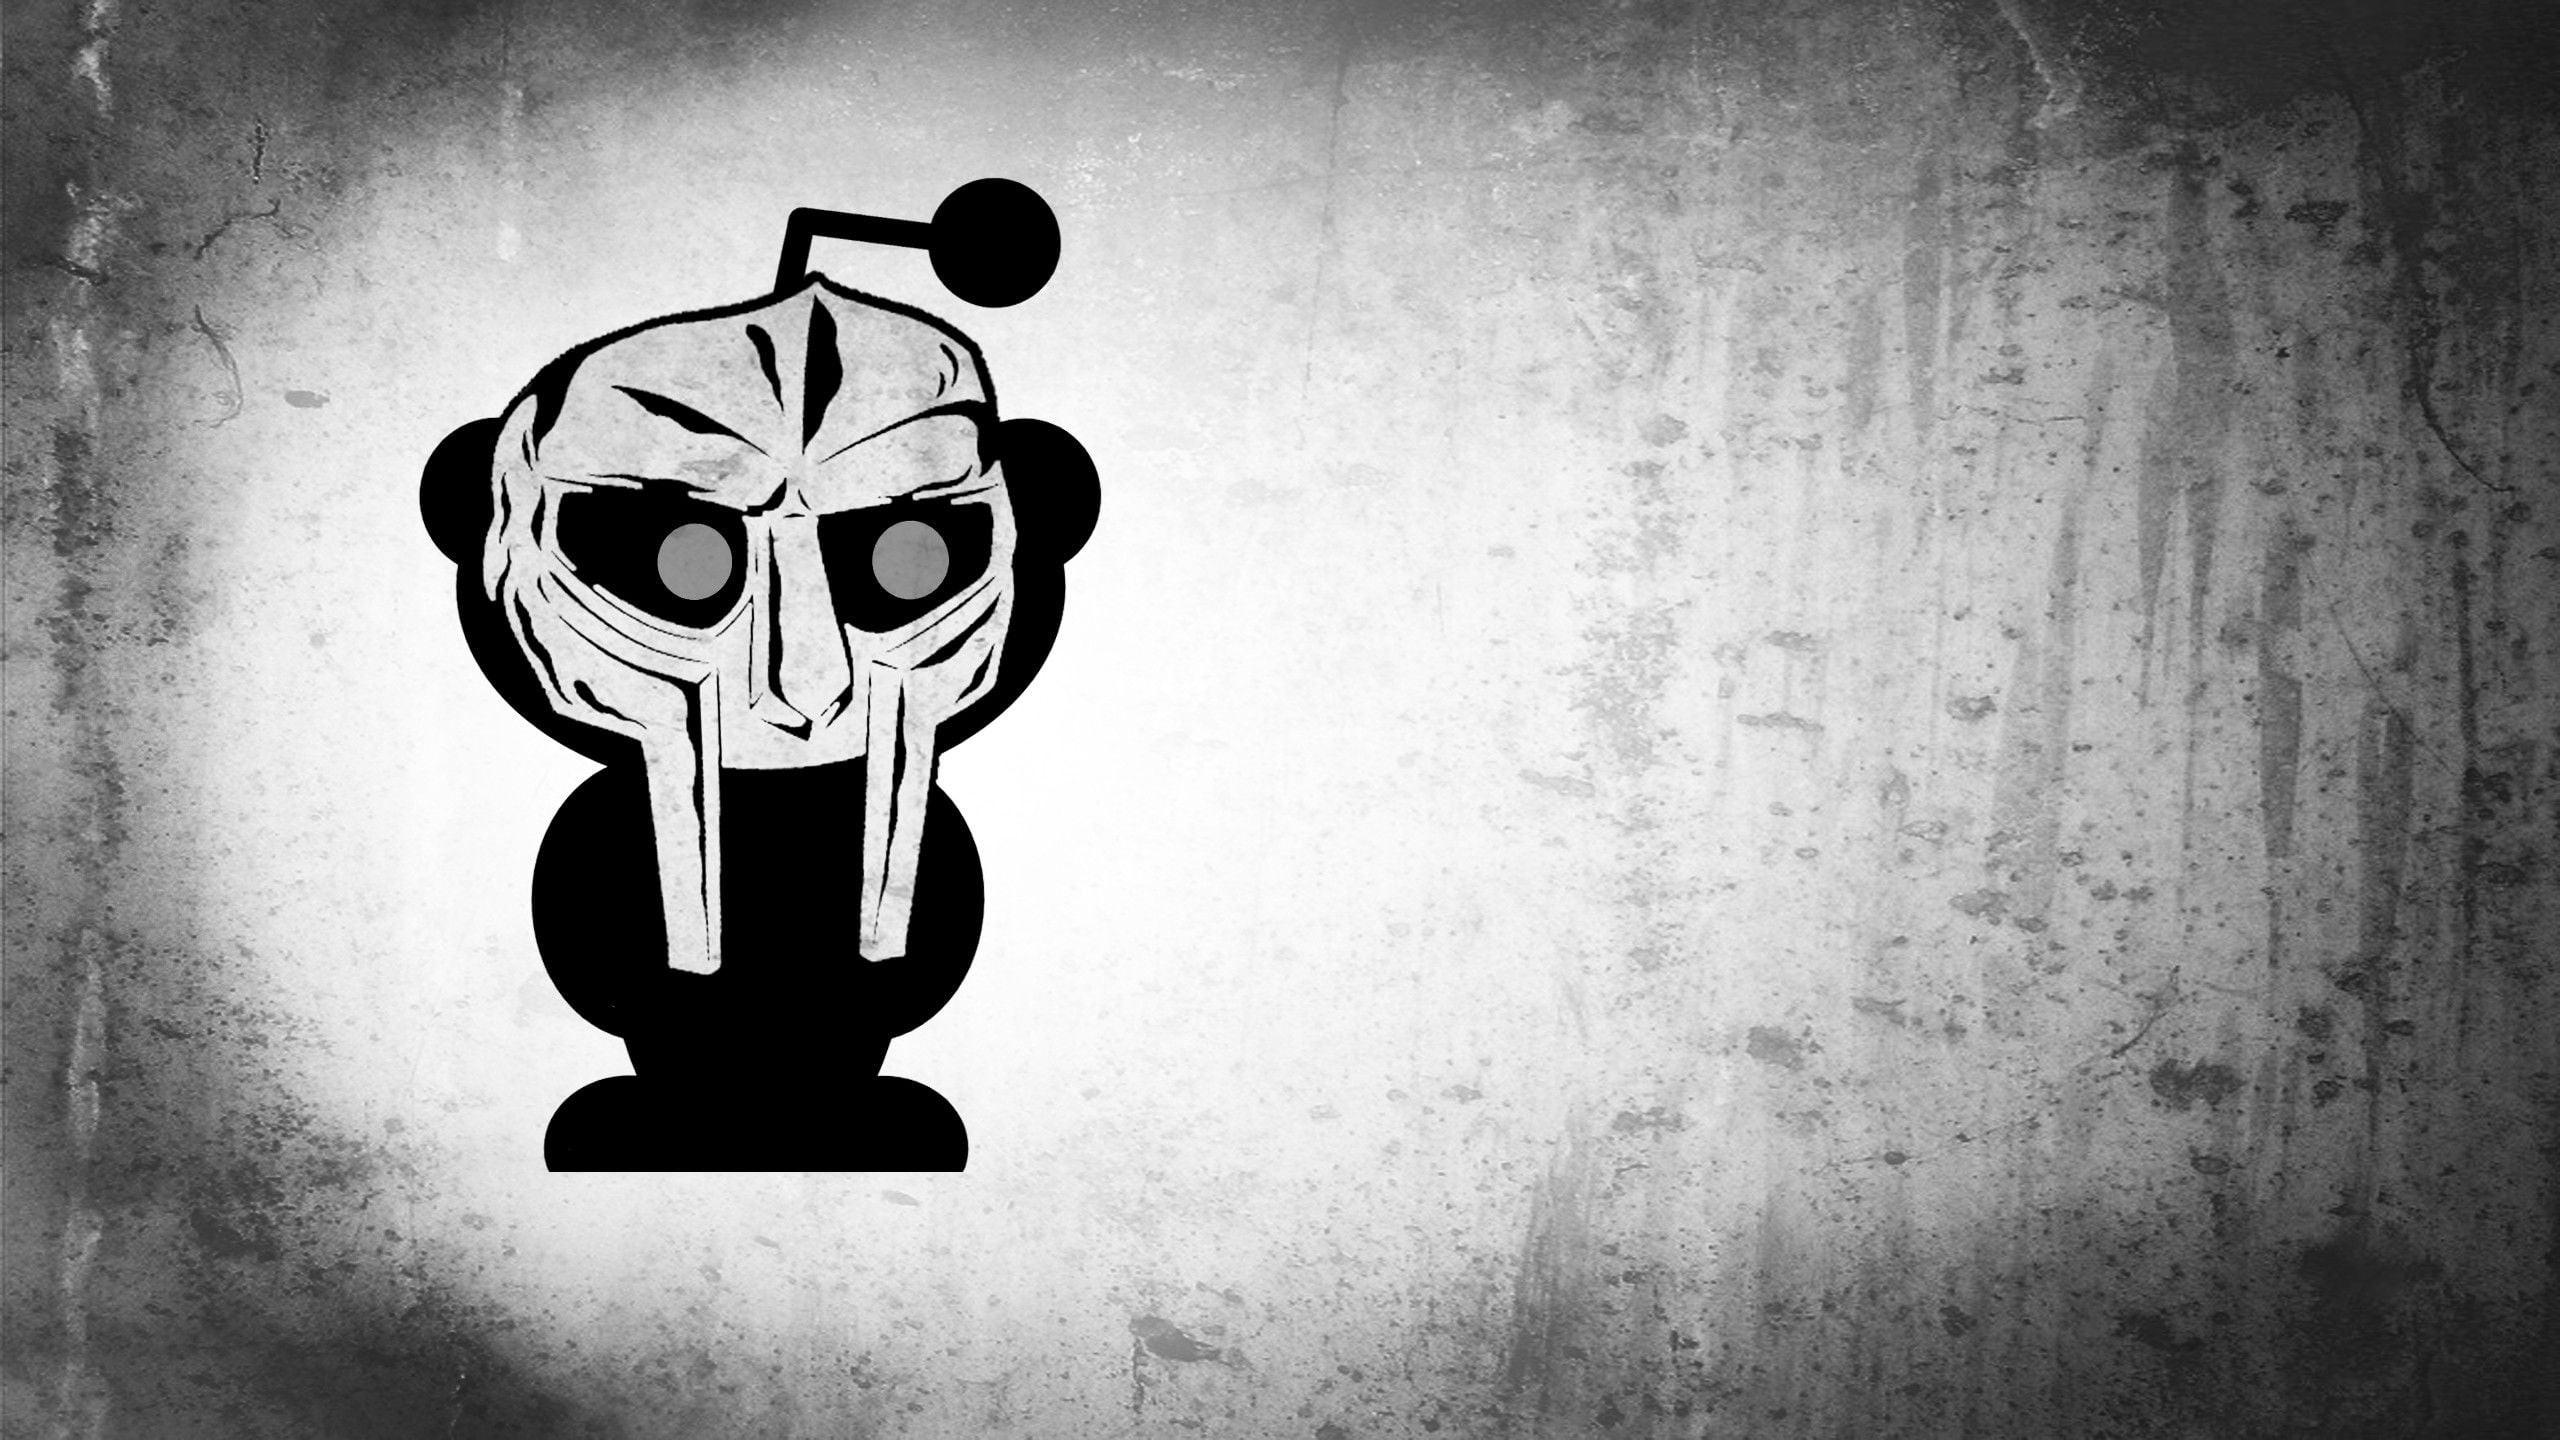 MF Doom wallpaper ·① Download free amazing wallpapers for ...